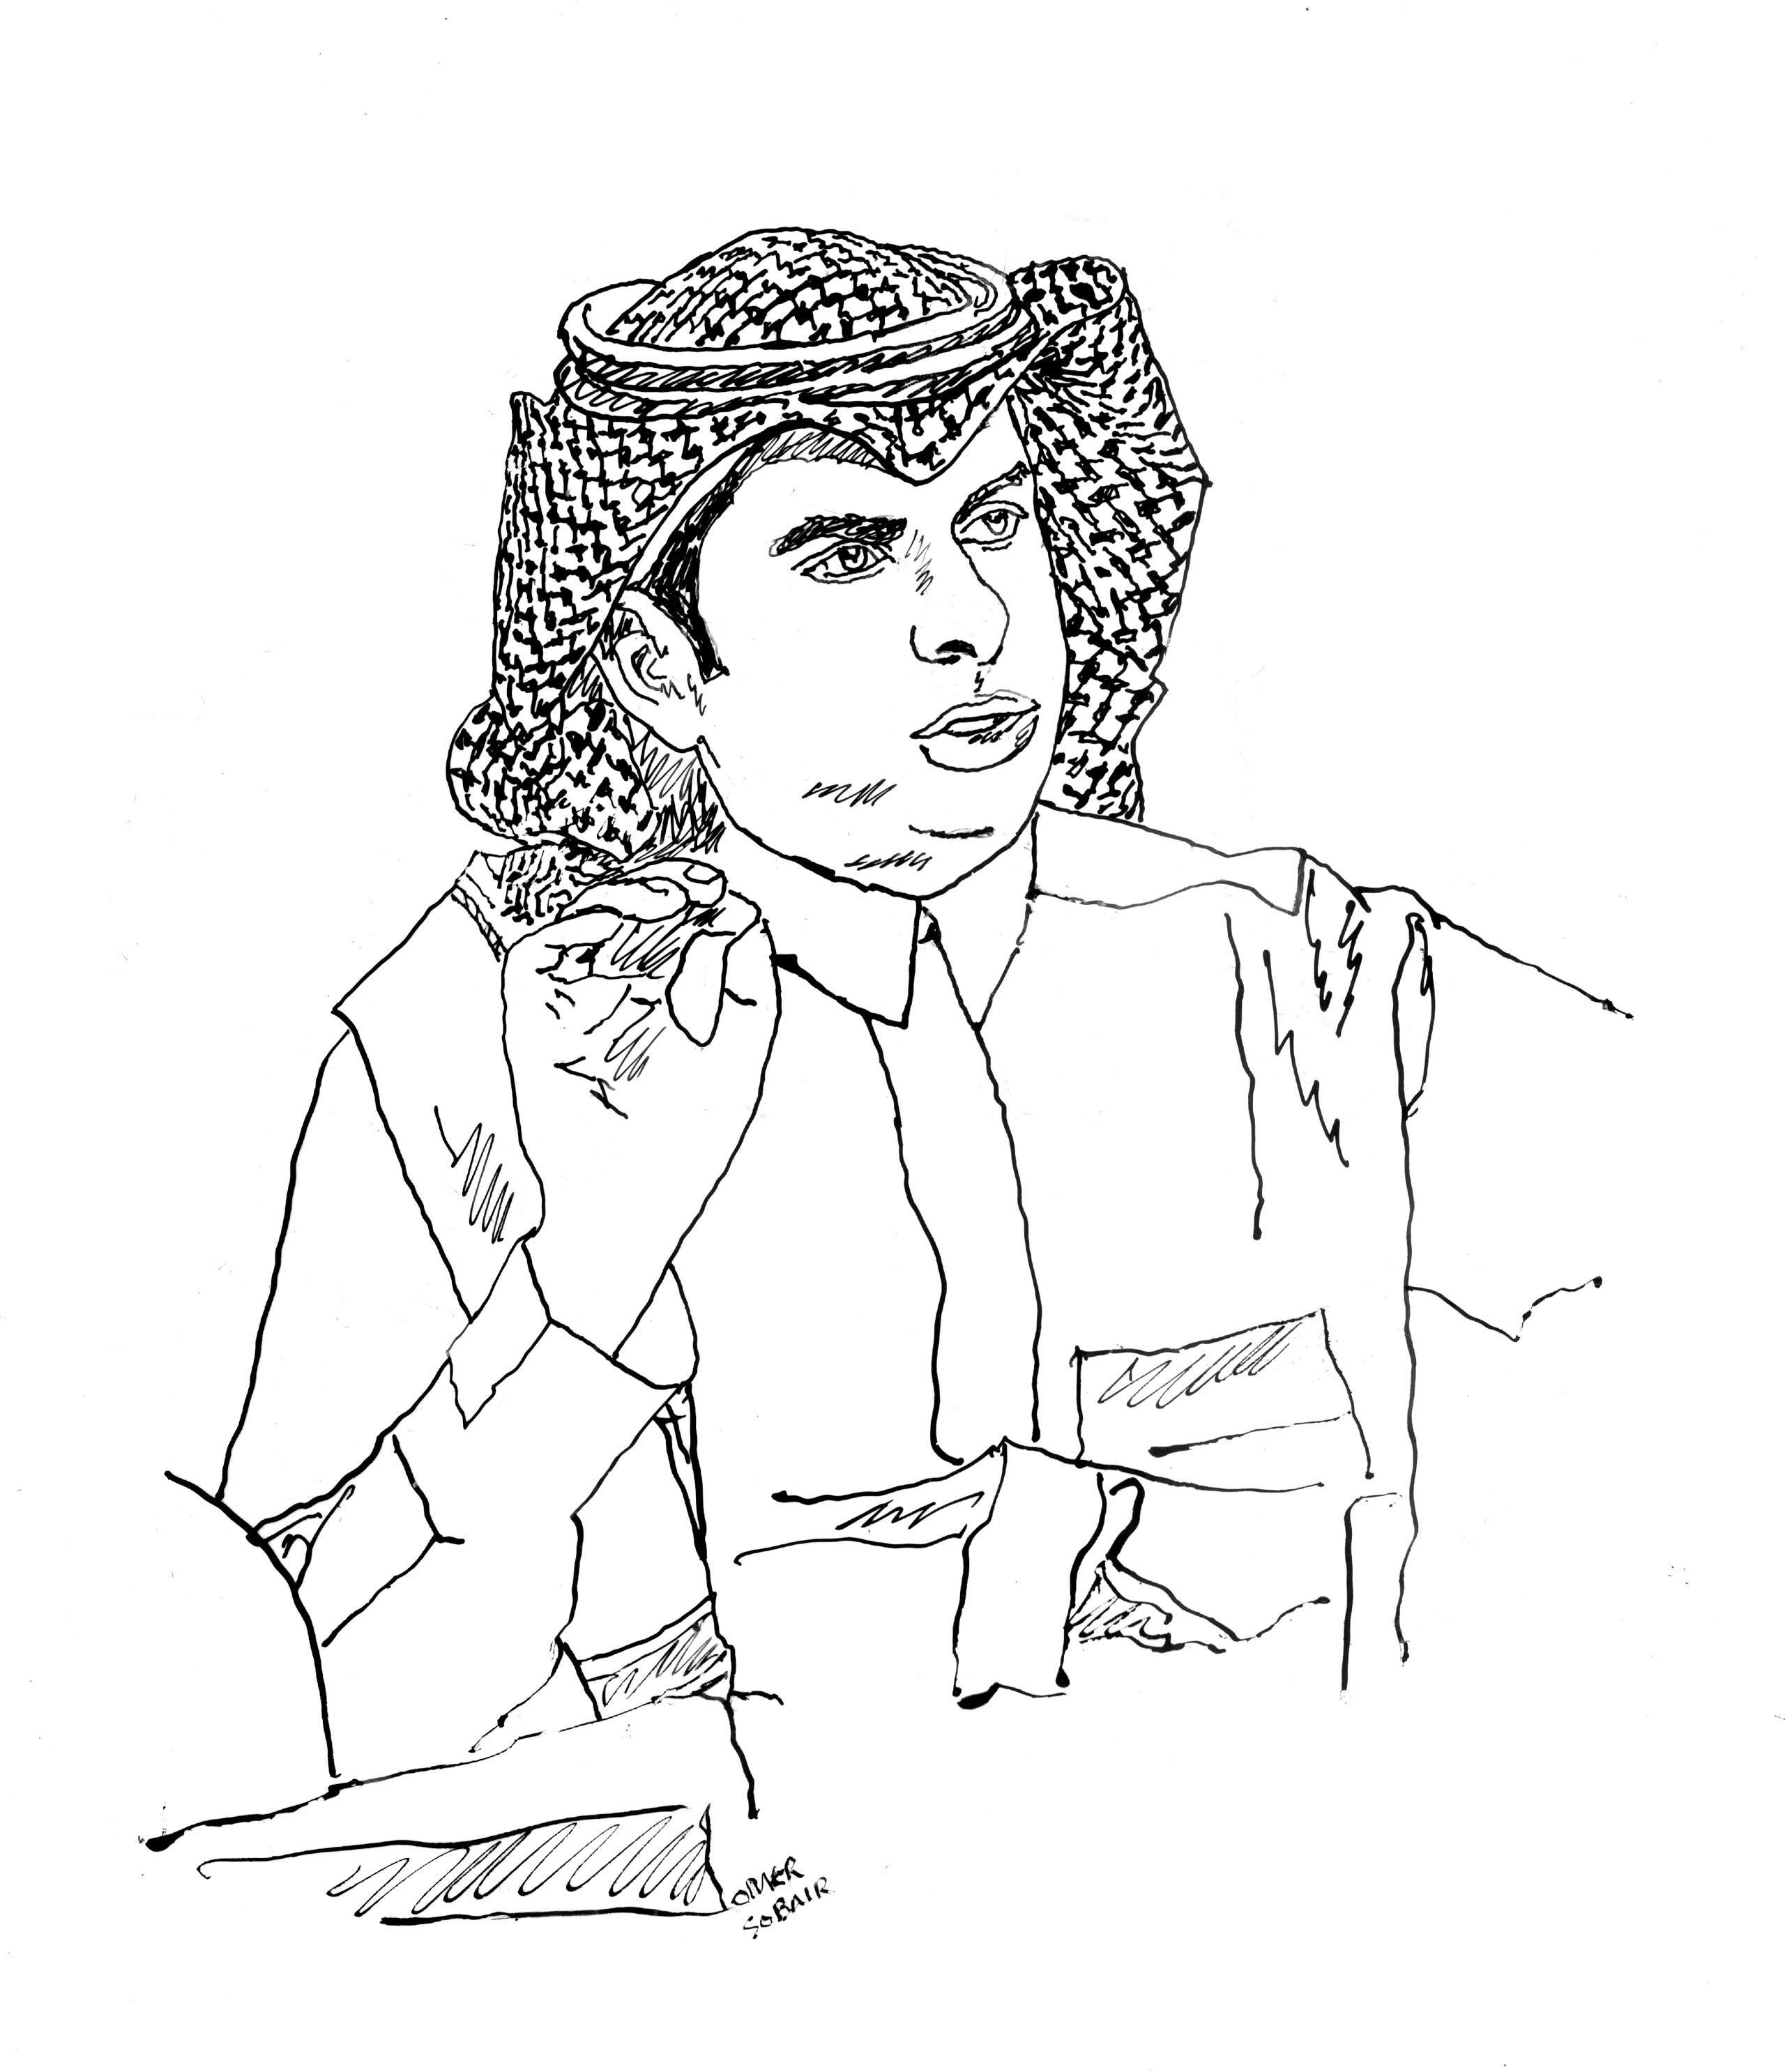 Iyad Alhakmi